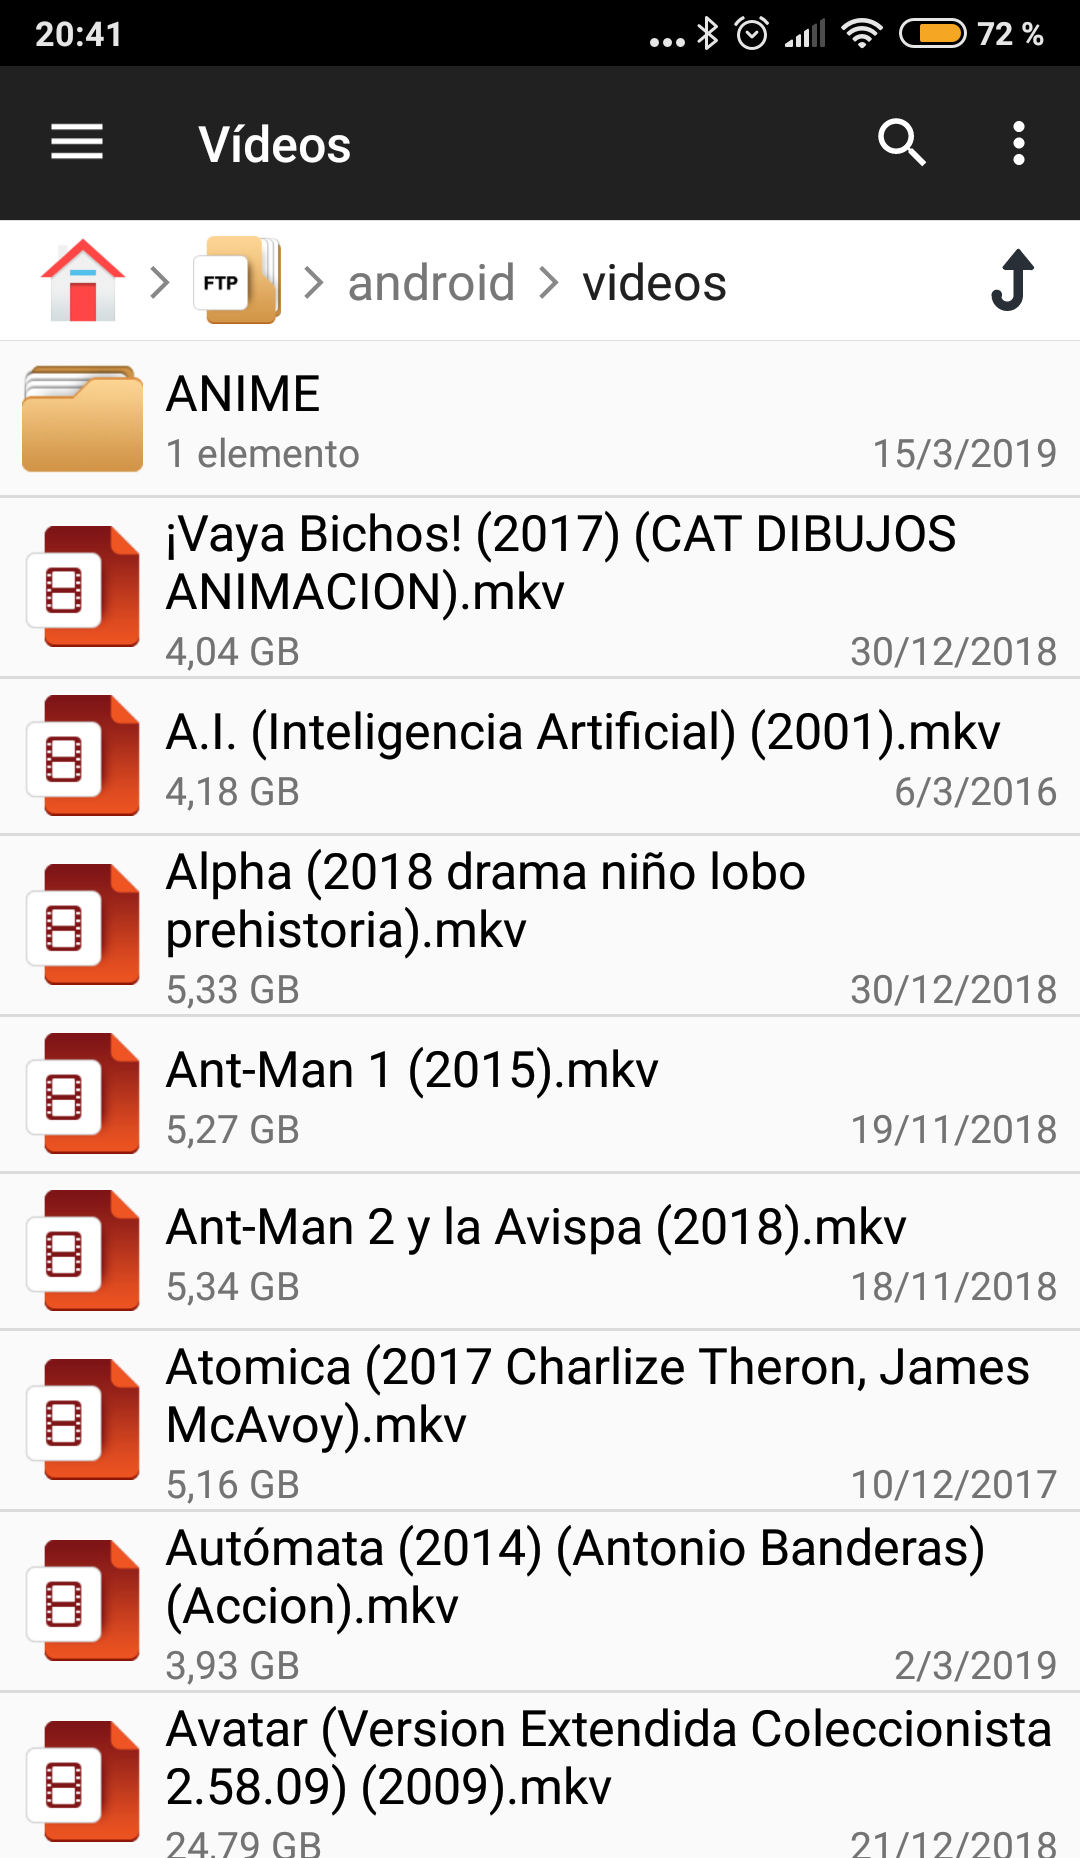 ftp android ficheros archivos